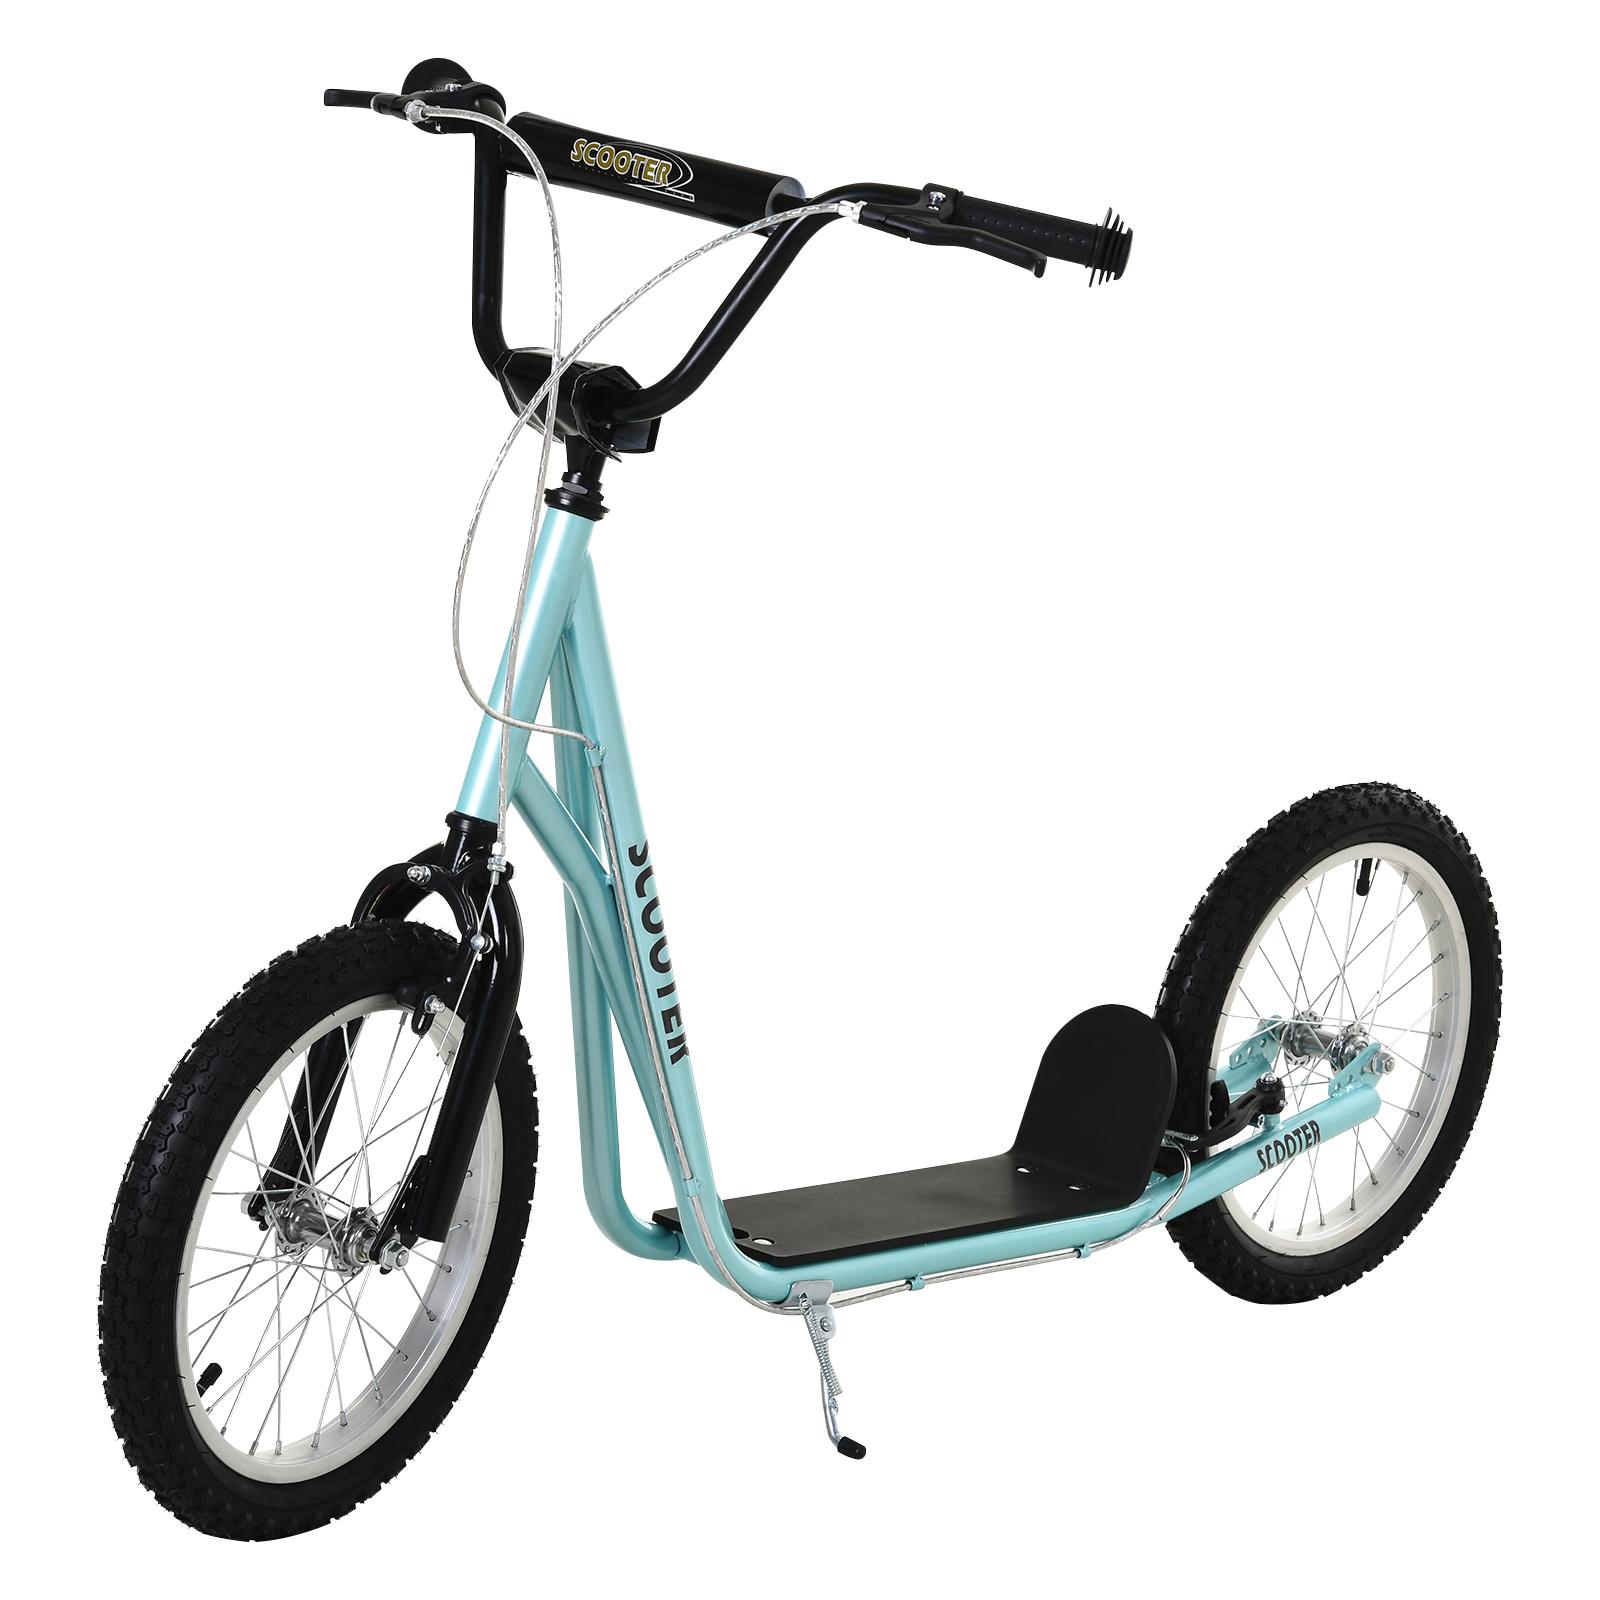 Indexbild 14 - HOMCOM-Tretroller-Kinderroller-Scooter-Cityroller-Roller-verstellbar-Blau-Gruen